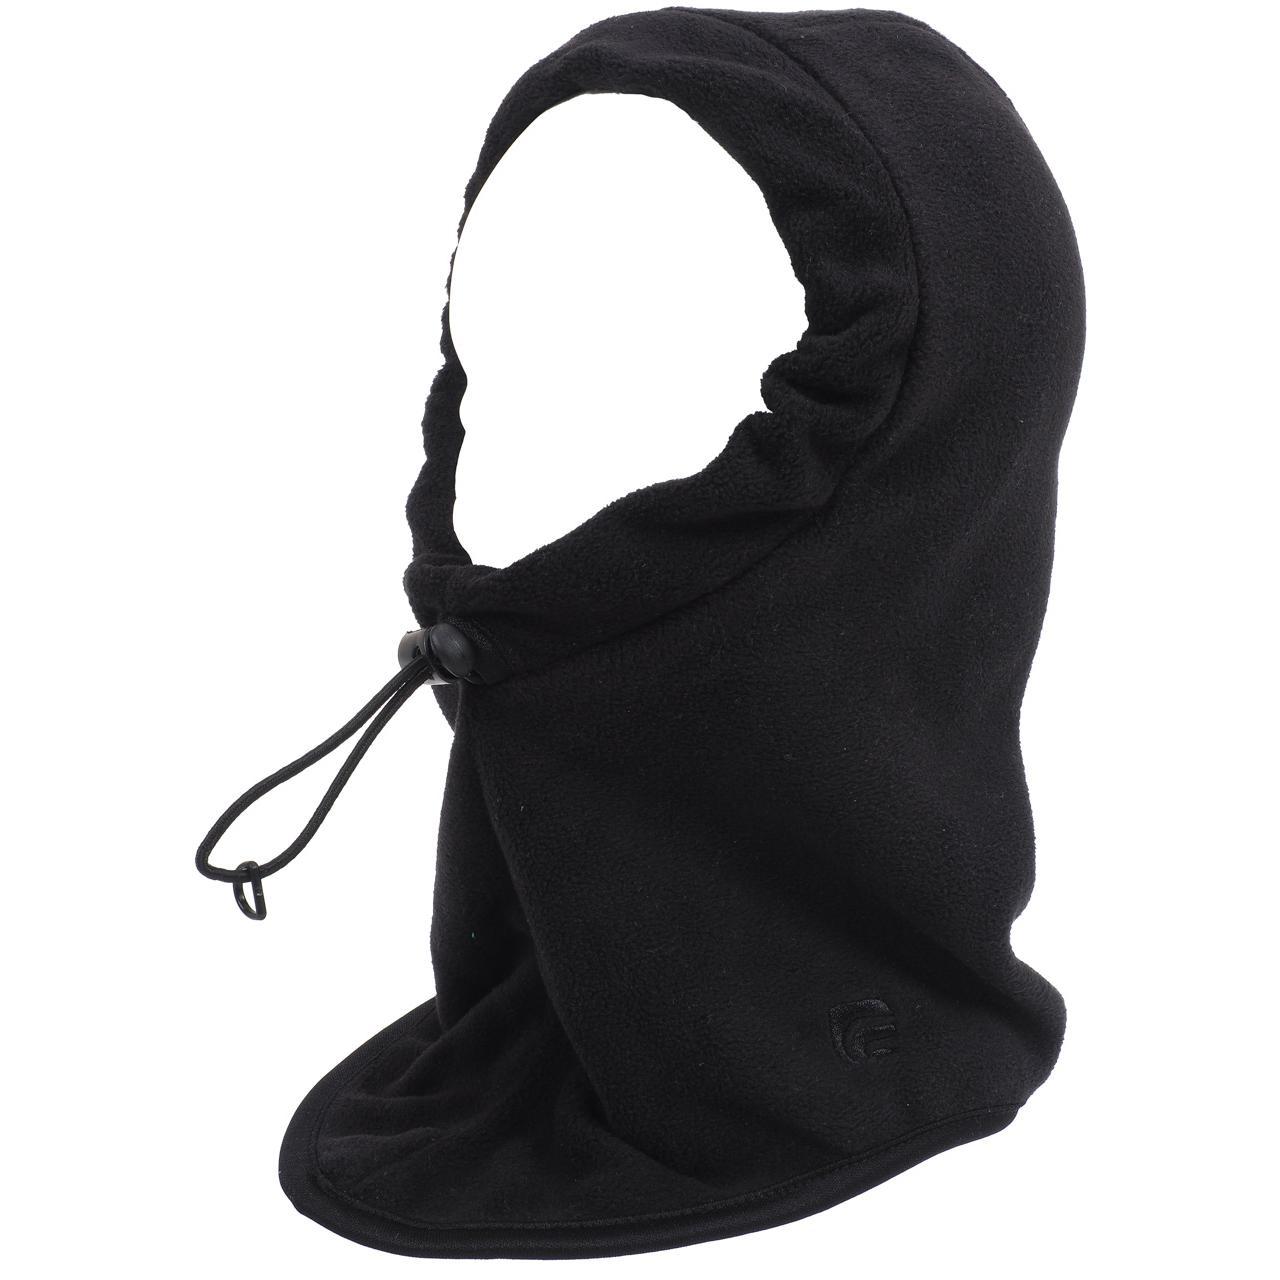 Hood-Winter-Cairn-Hood-Black-Polar-Jr-Black-31198-New